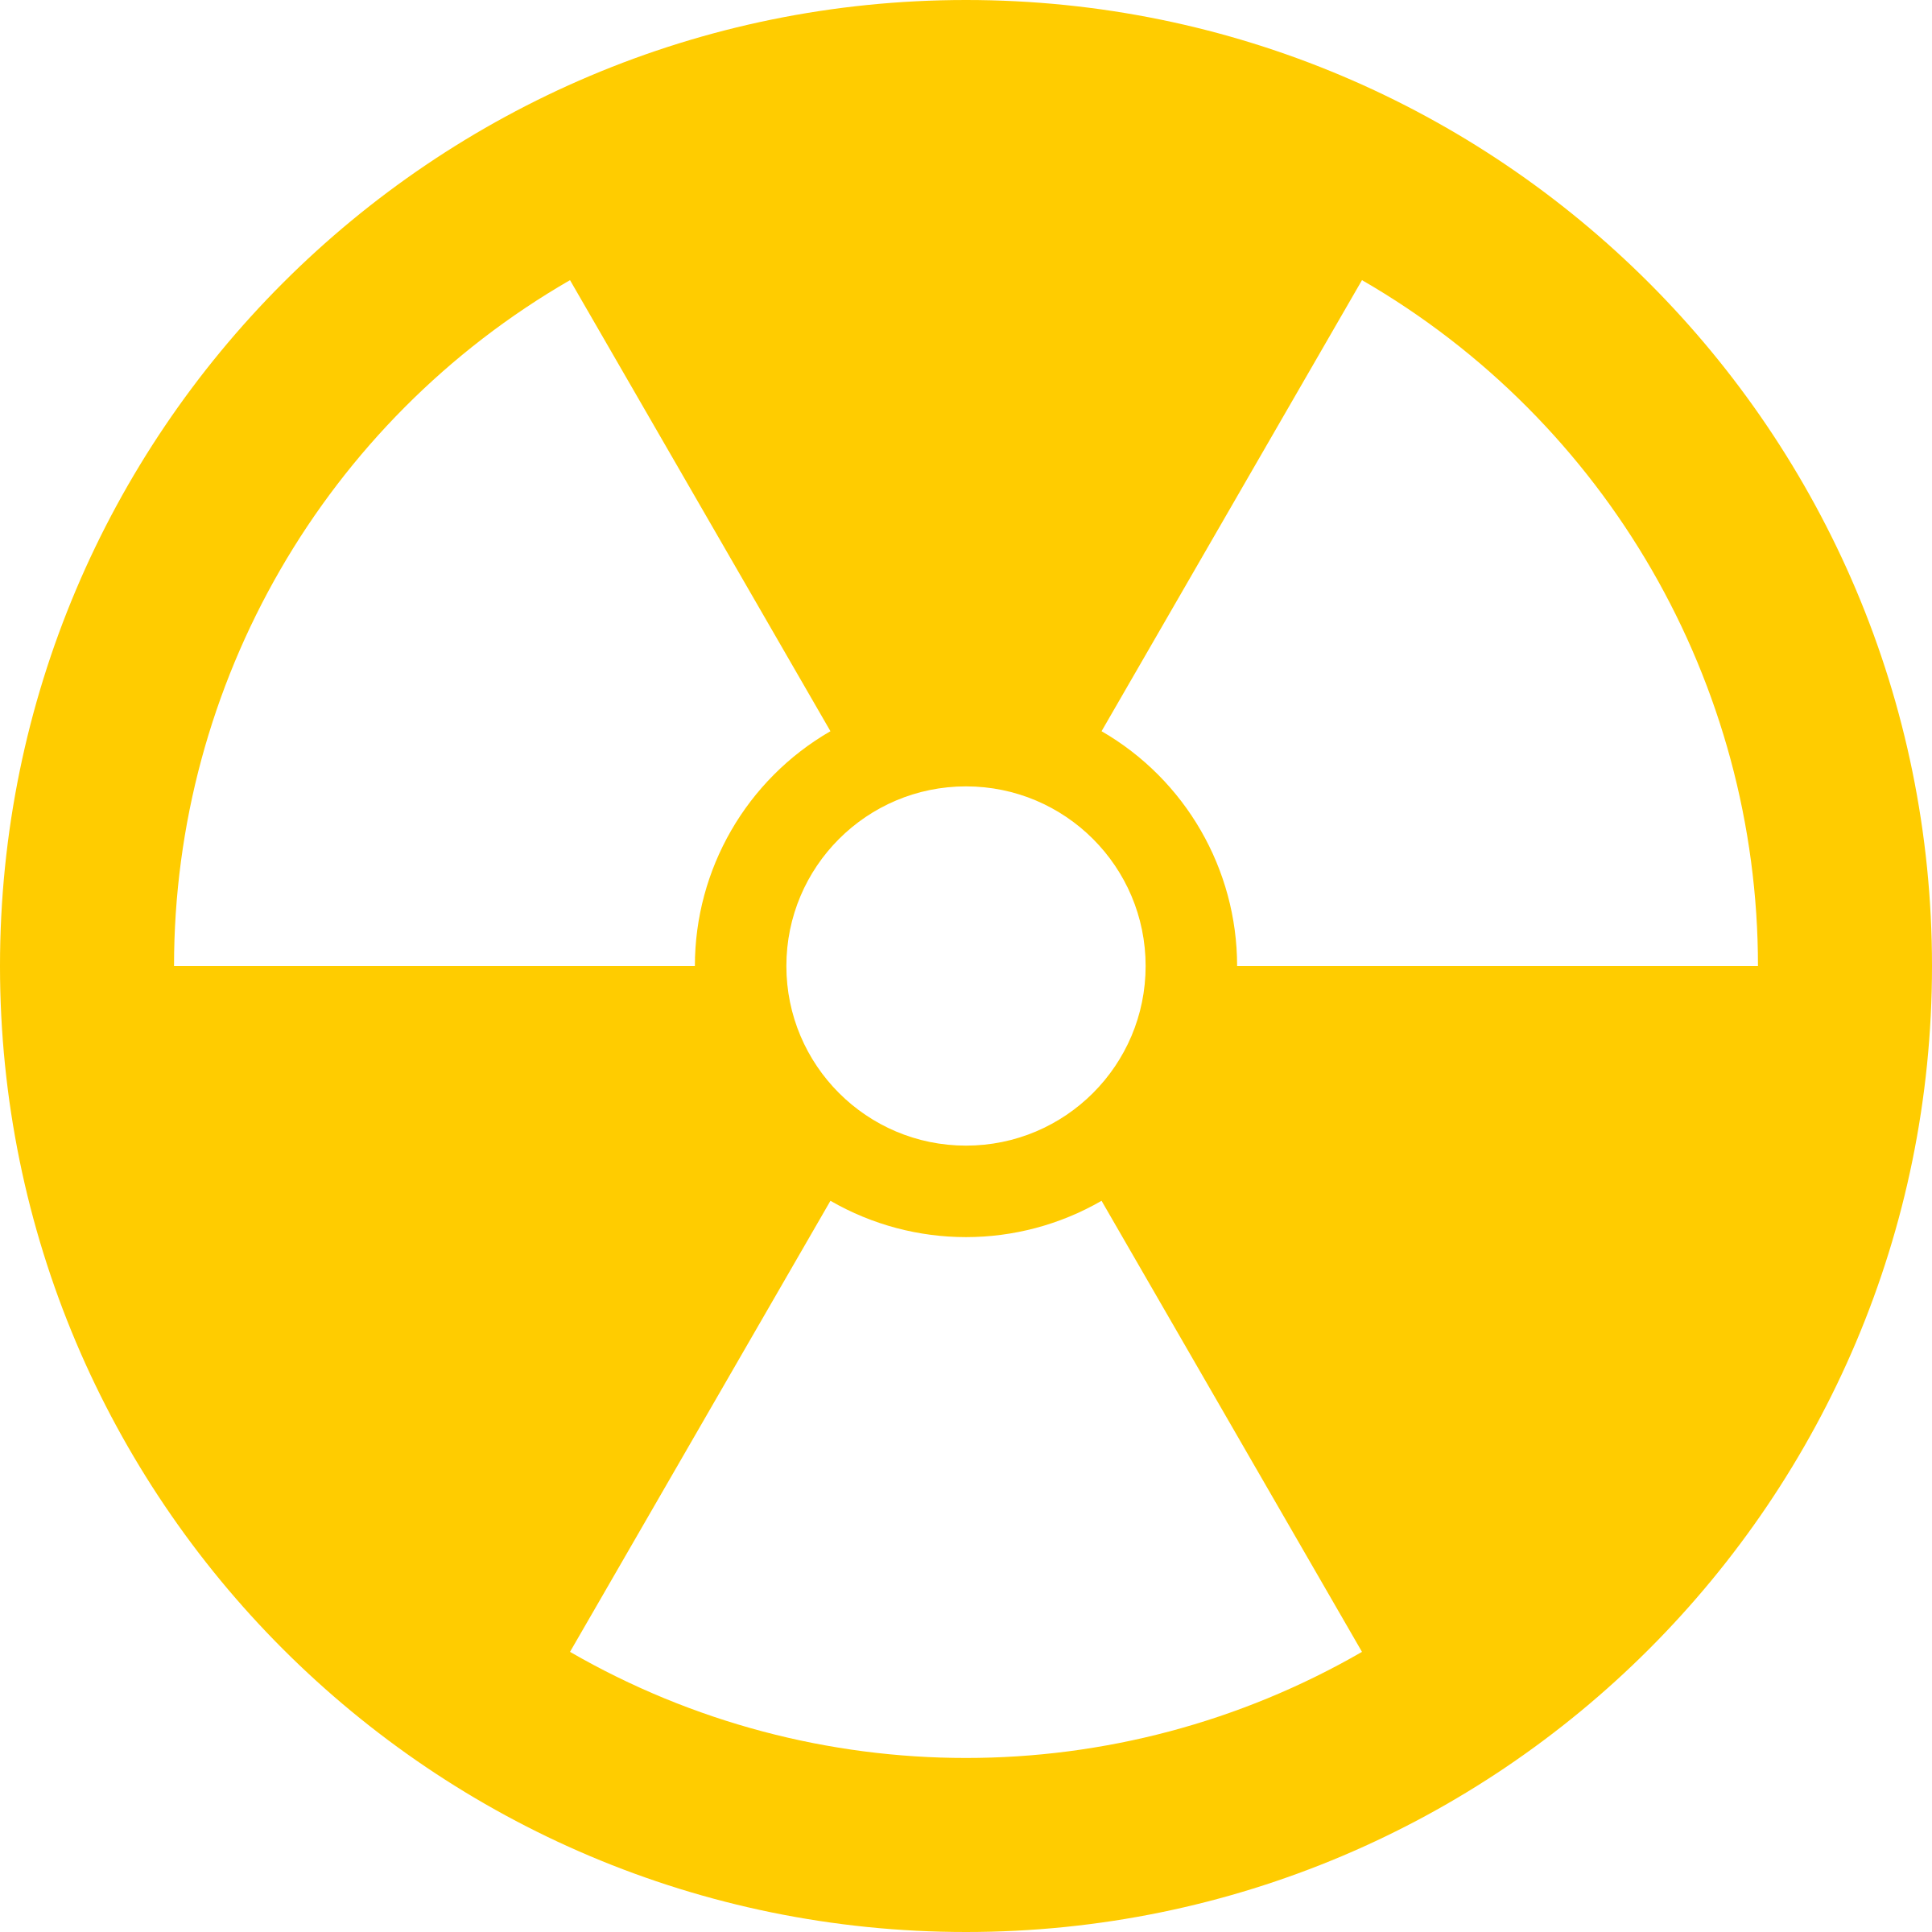 clipart radioactive transparent icon